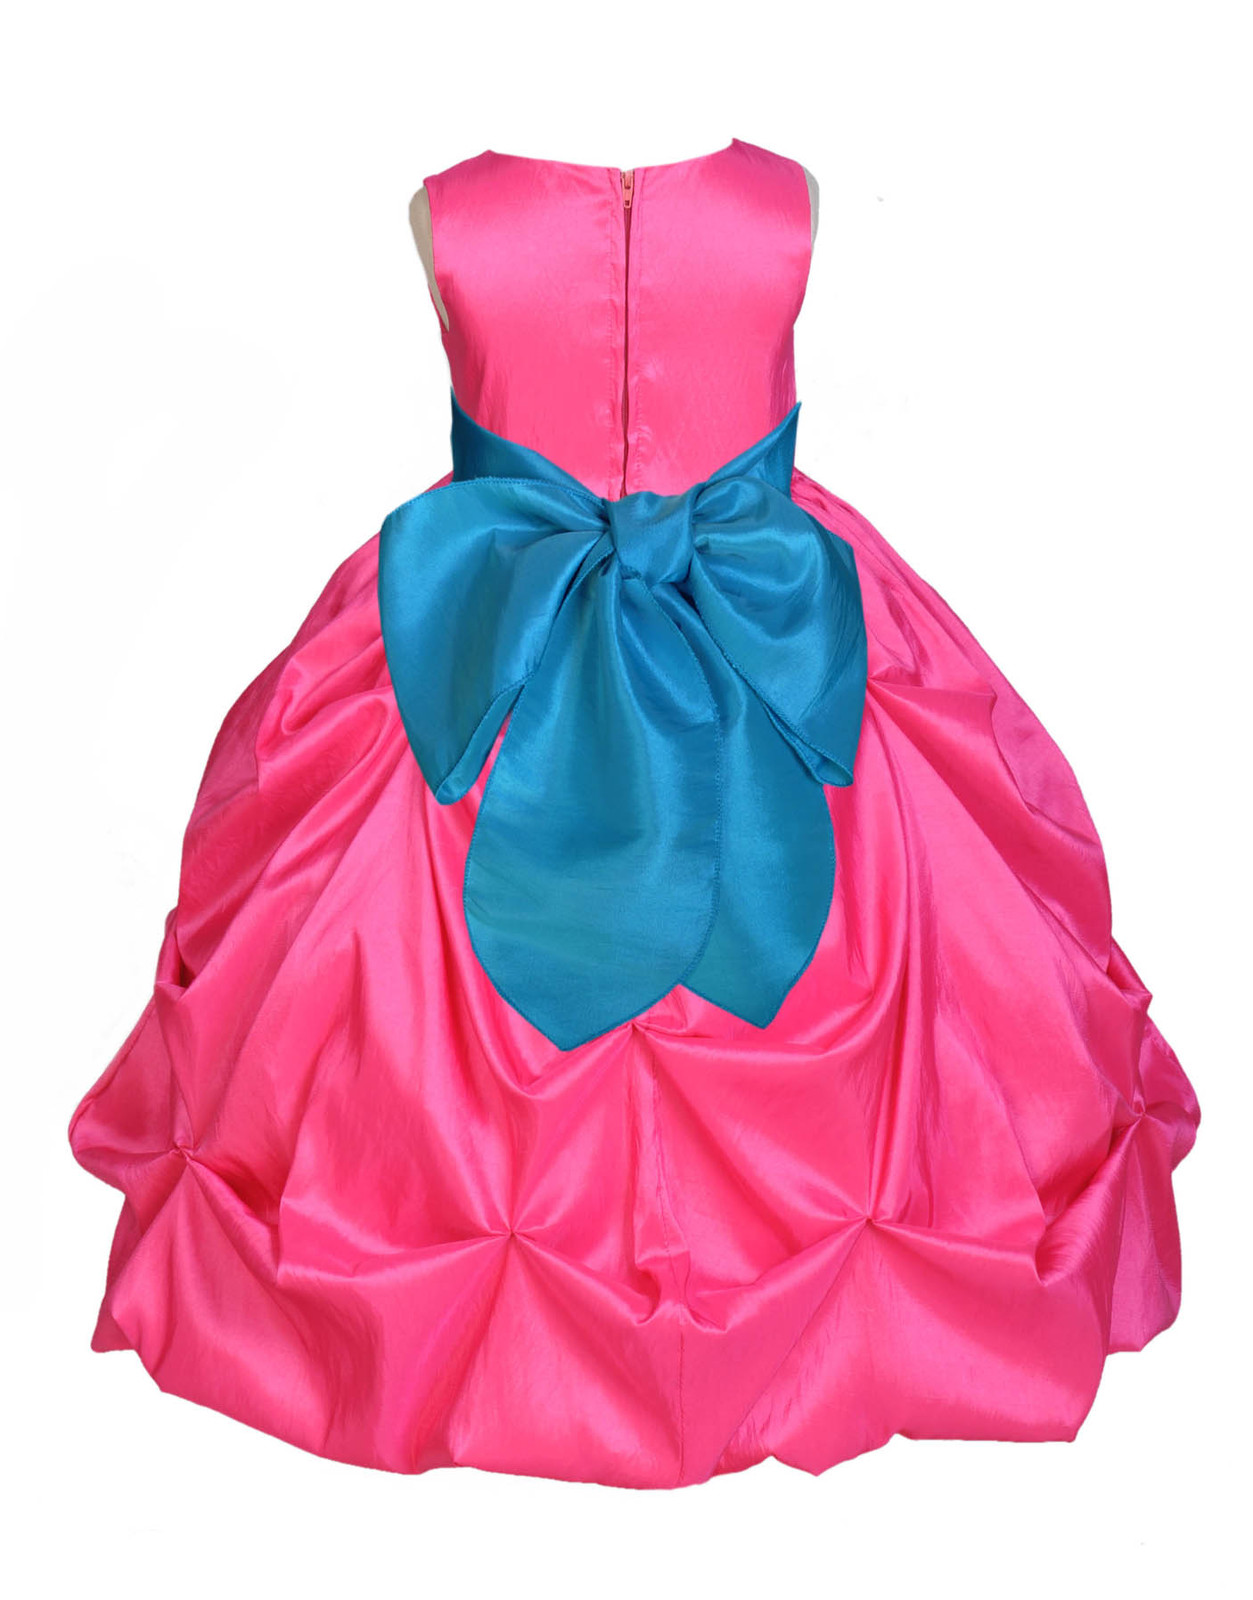 Fuchsia Taffeta Flower Girl Dress Wedding Pageant Bridesmaid Toddler 301S